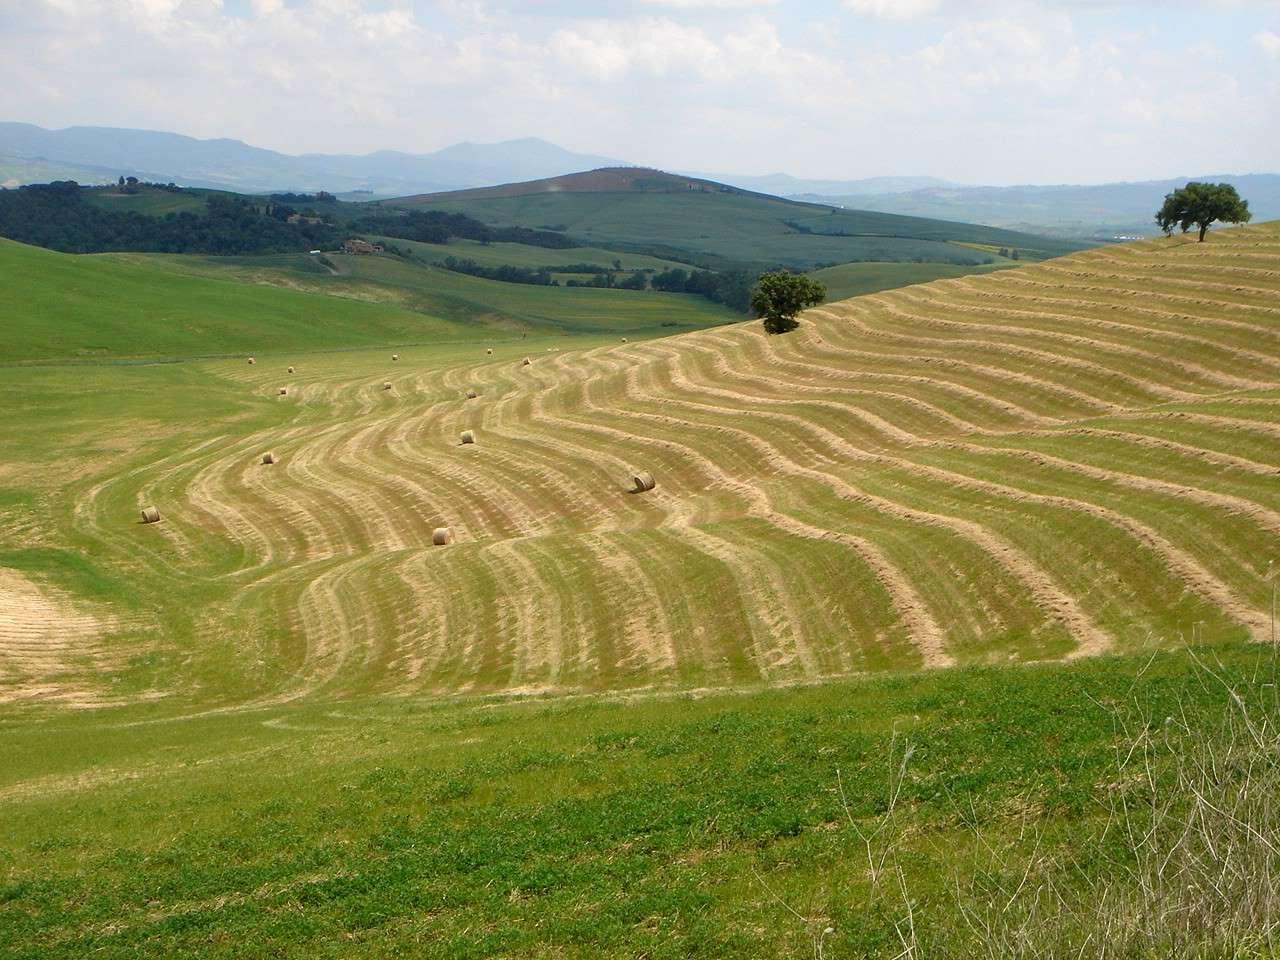 Foto: Manfred Karl / Mountainbike Tour / Von Bagno Vignoni nach Pienza / 20.06.2007 17:45:11